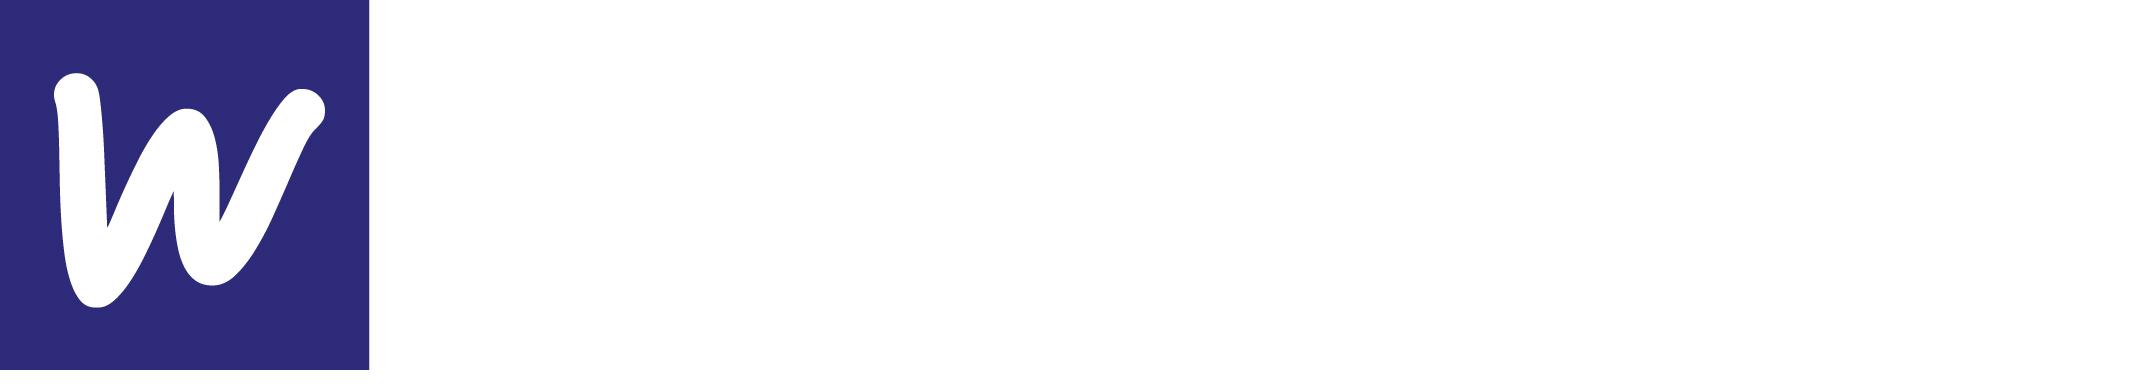 AHR Private Wealth in Media